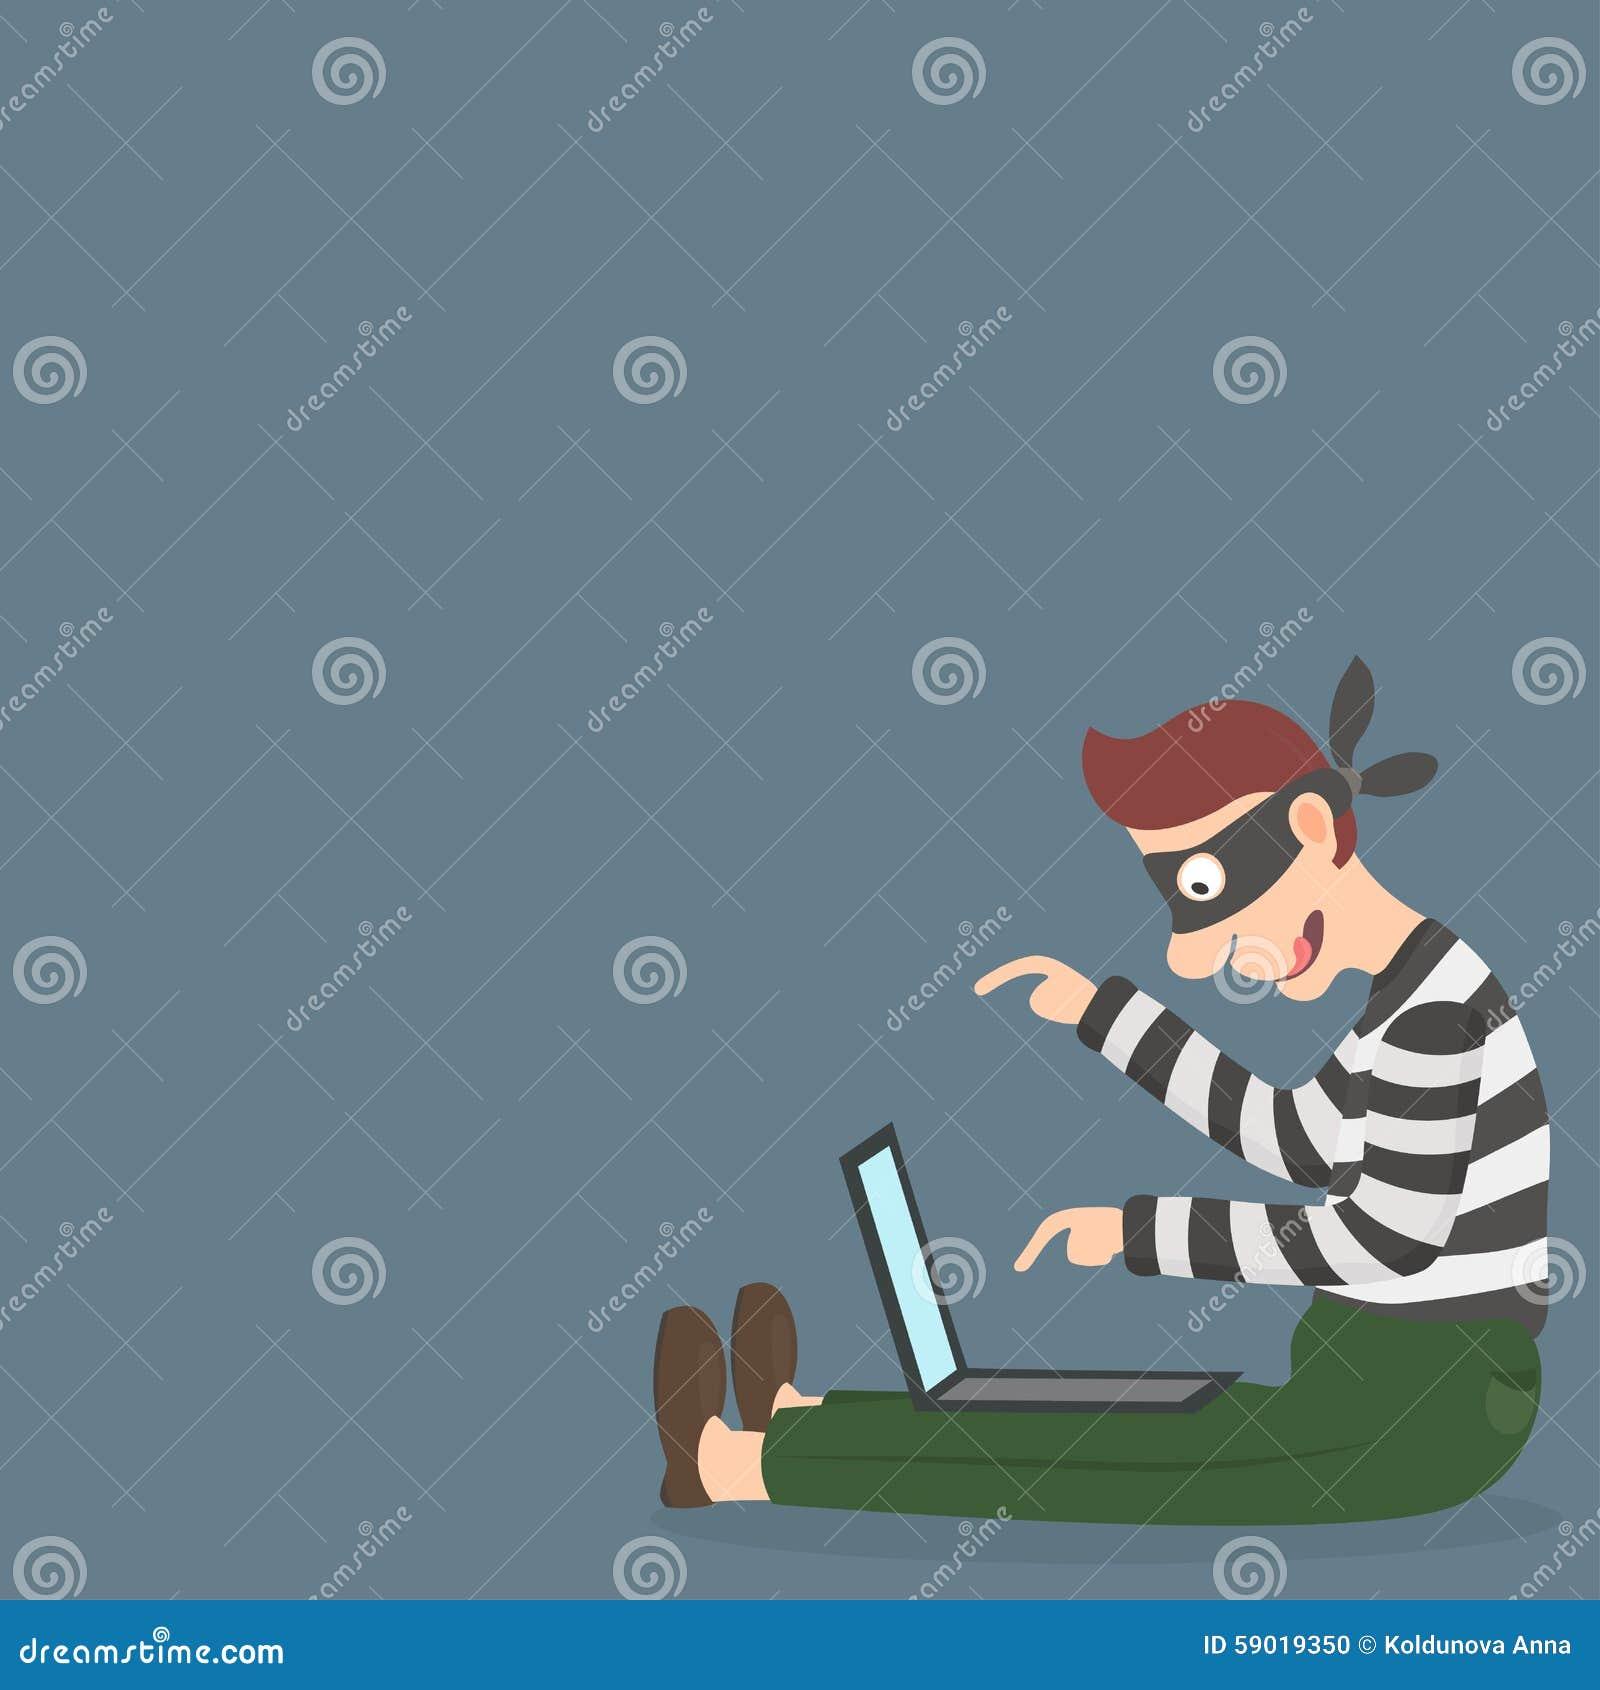 Steal information online dating